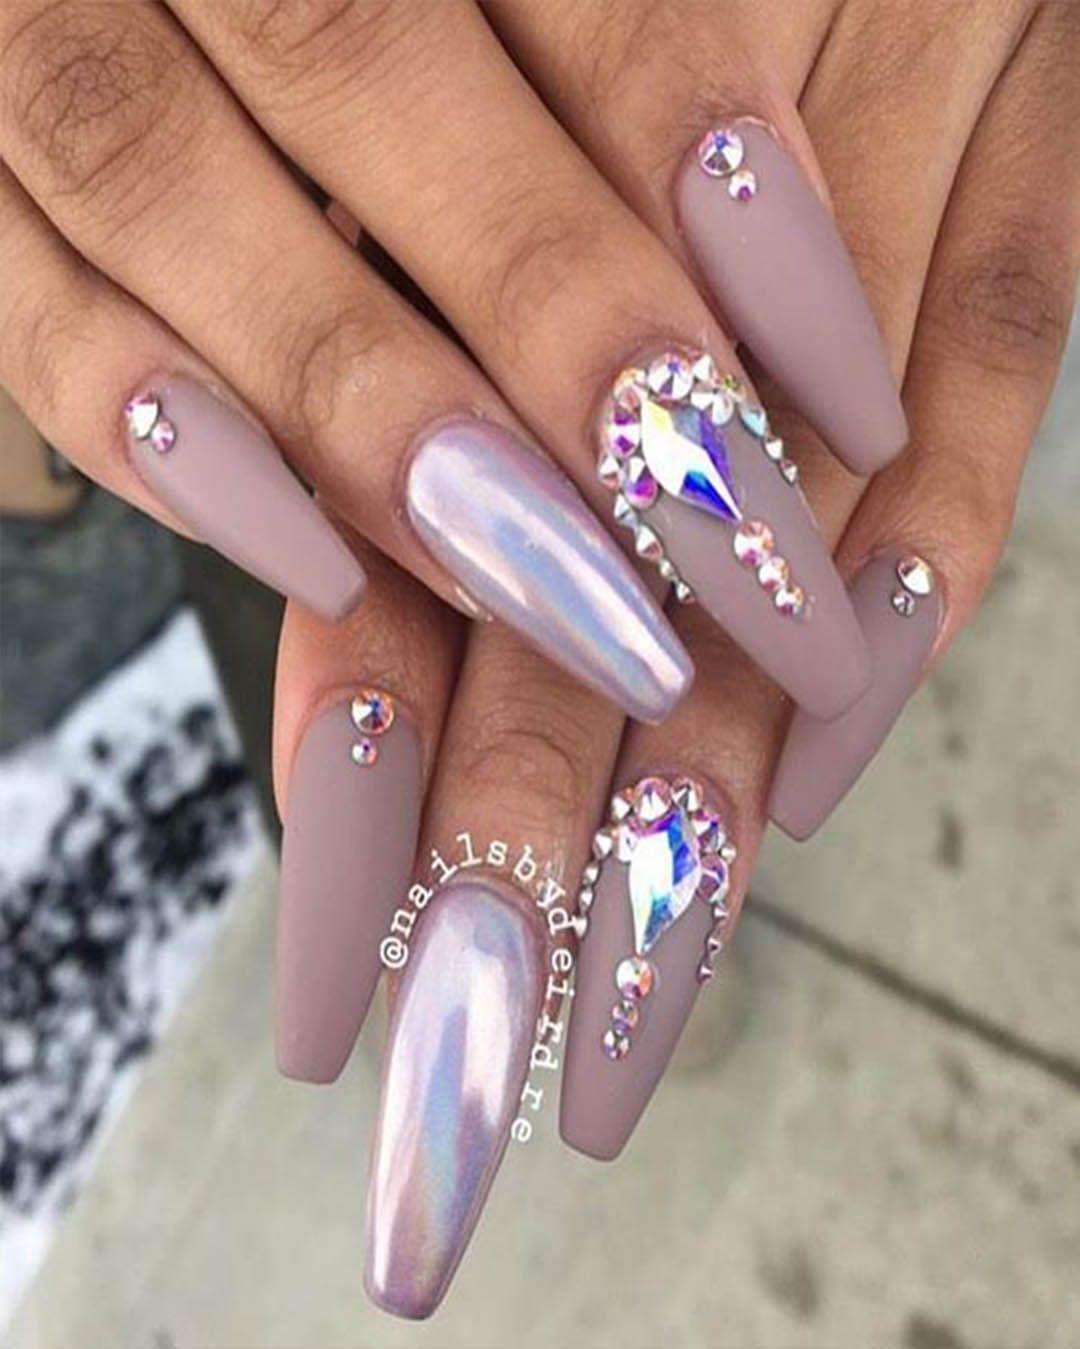 Elegant Coffin Nail Designs With Rhinestones Nails Design With Rhinestones Gem Nails Nail Designs